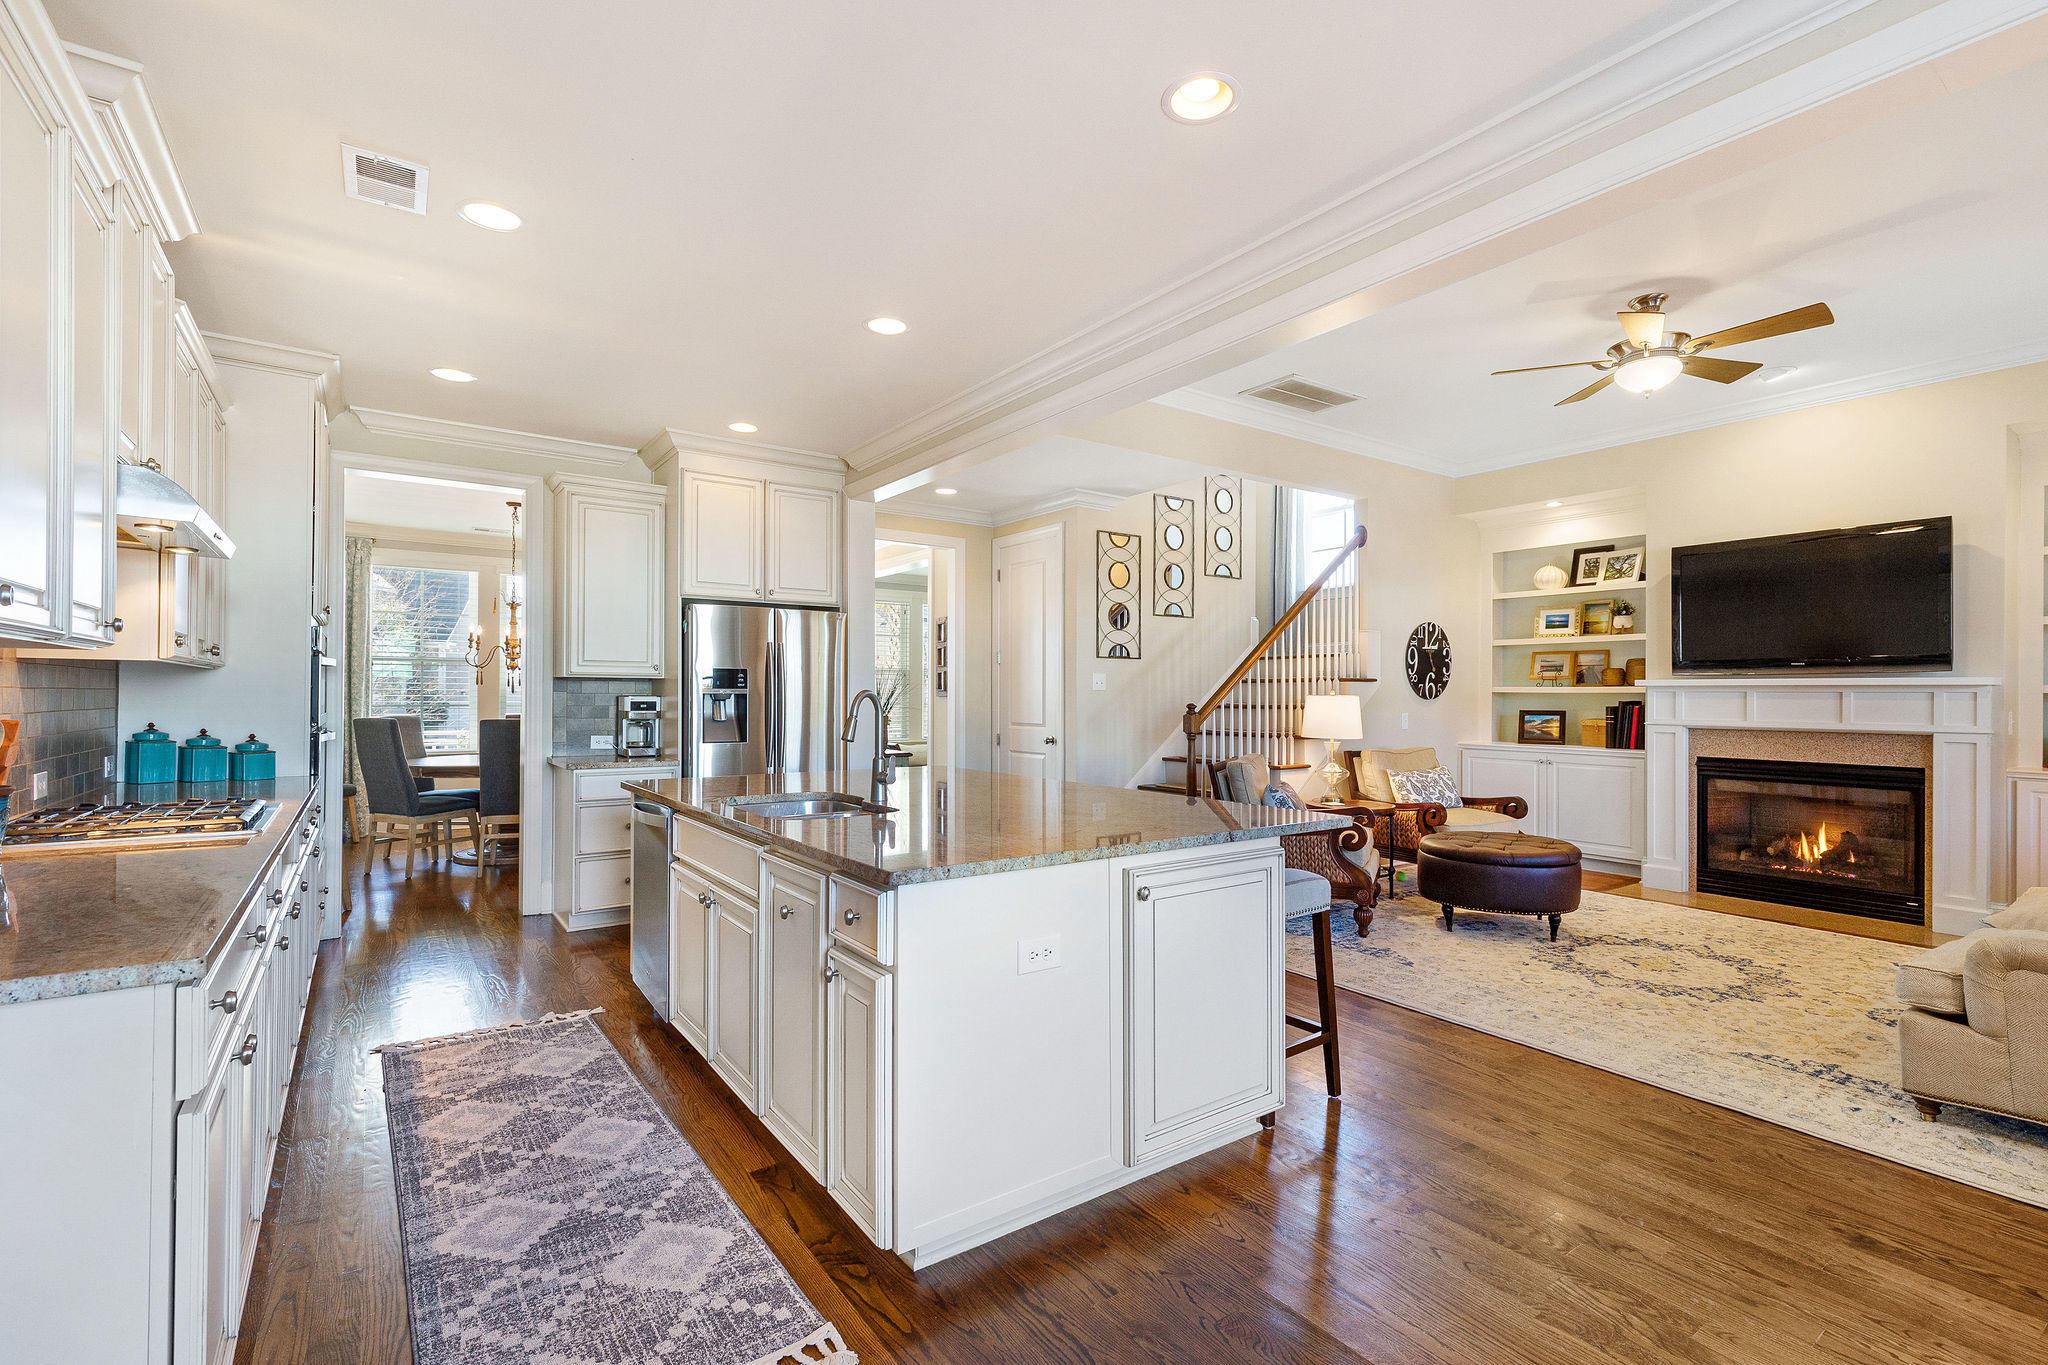 Dunes West Homes For Sale - 3212 Hatchway, Mount Pleasant, SC - 37